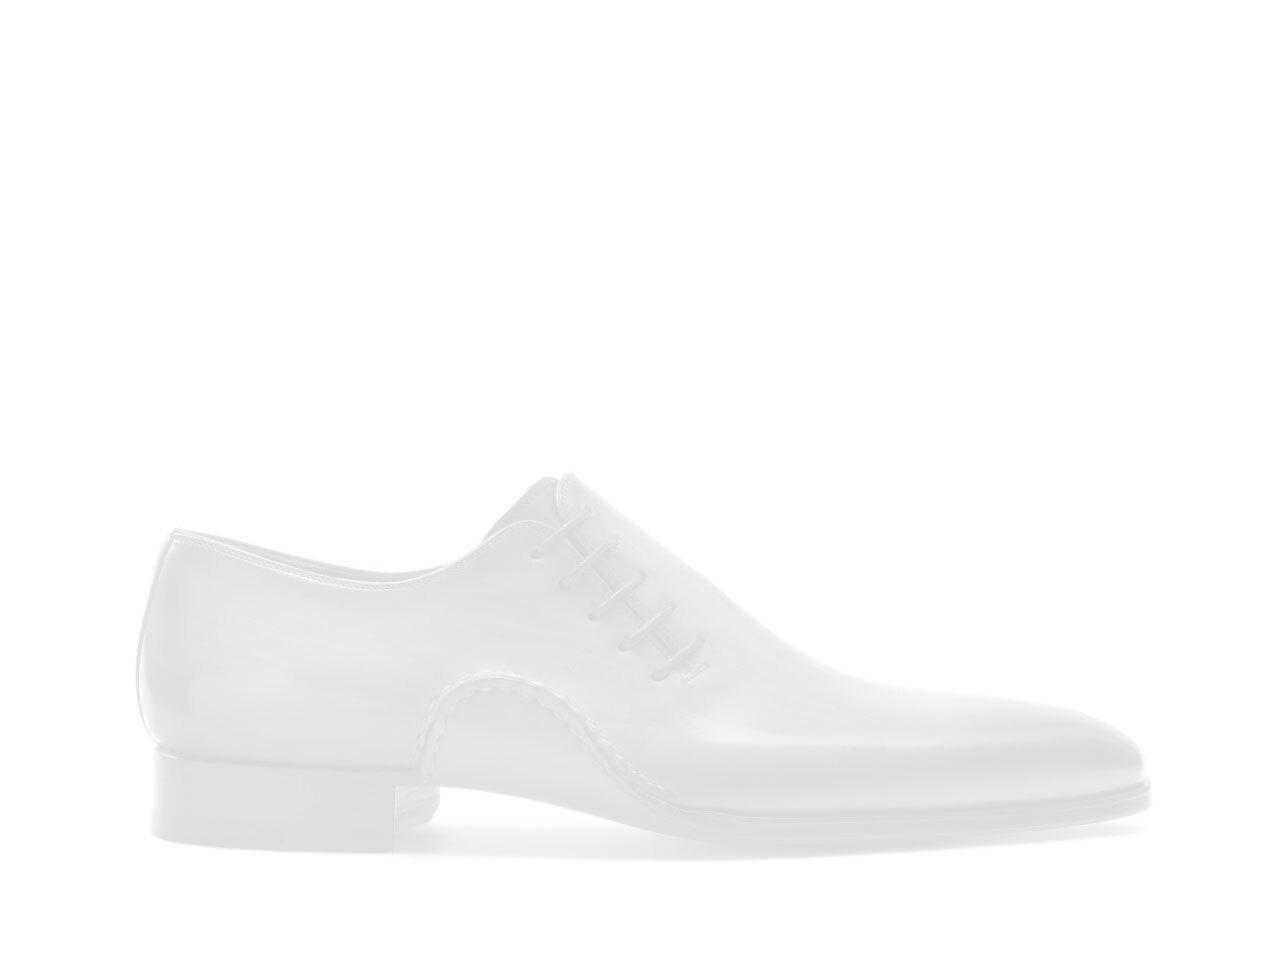 Sole of the Magnanni Marco II Cognac Suede Men's Single Monk Strap Shoes